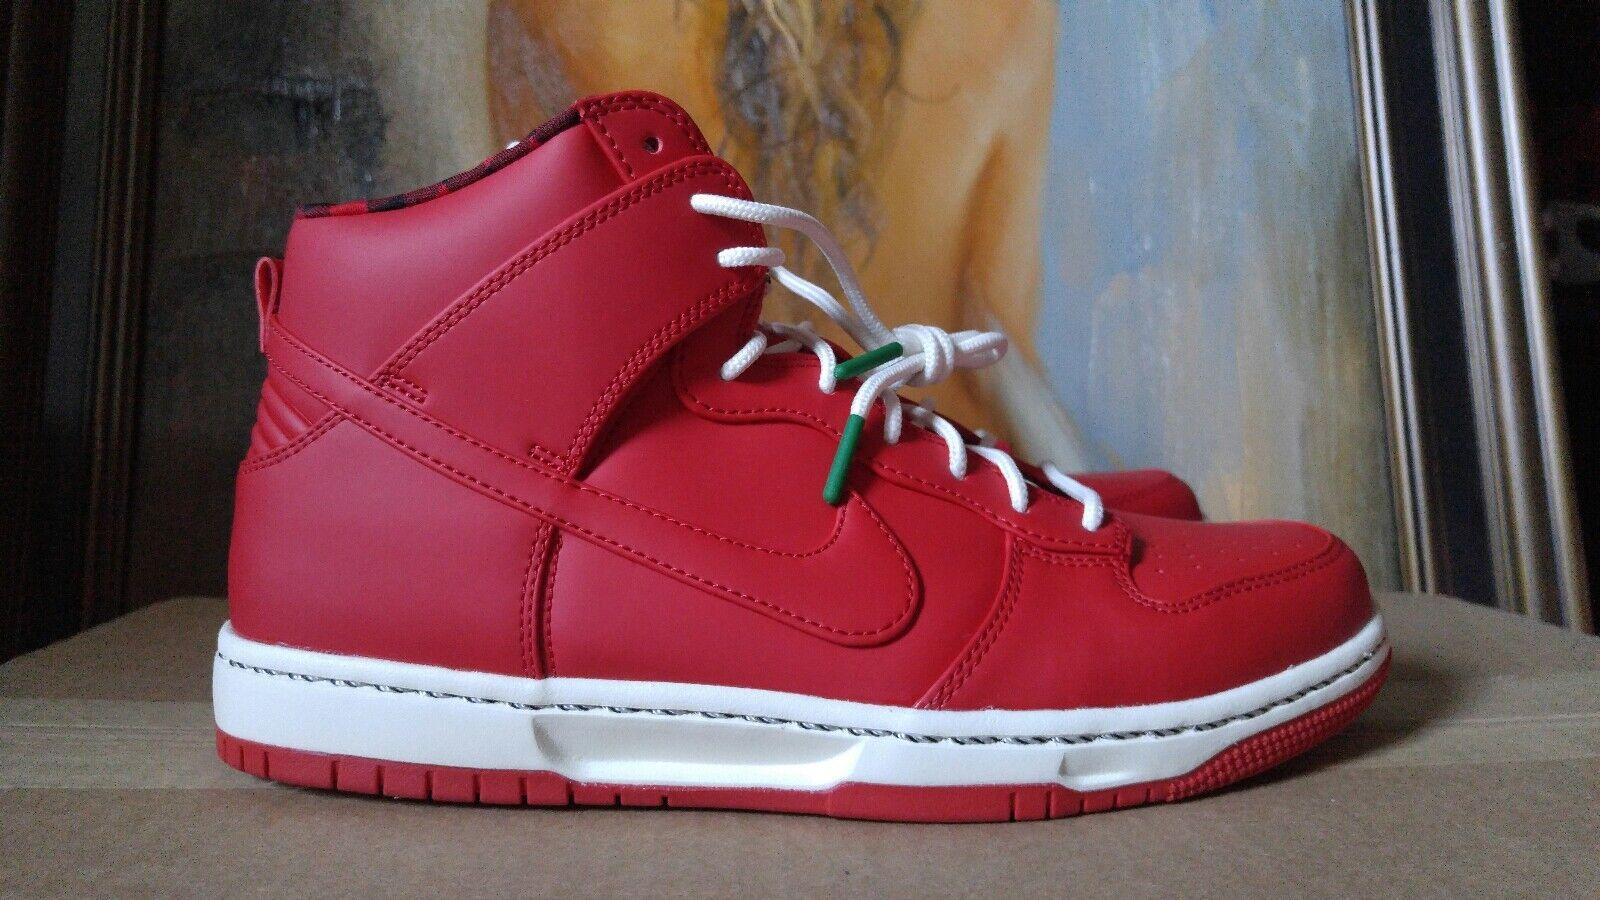 Nike Dunk Ultra Size 9 9.5 Sport Red Sail Black Rain Jacket Umbrella 845055 601